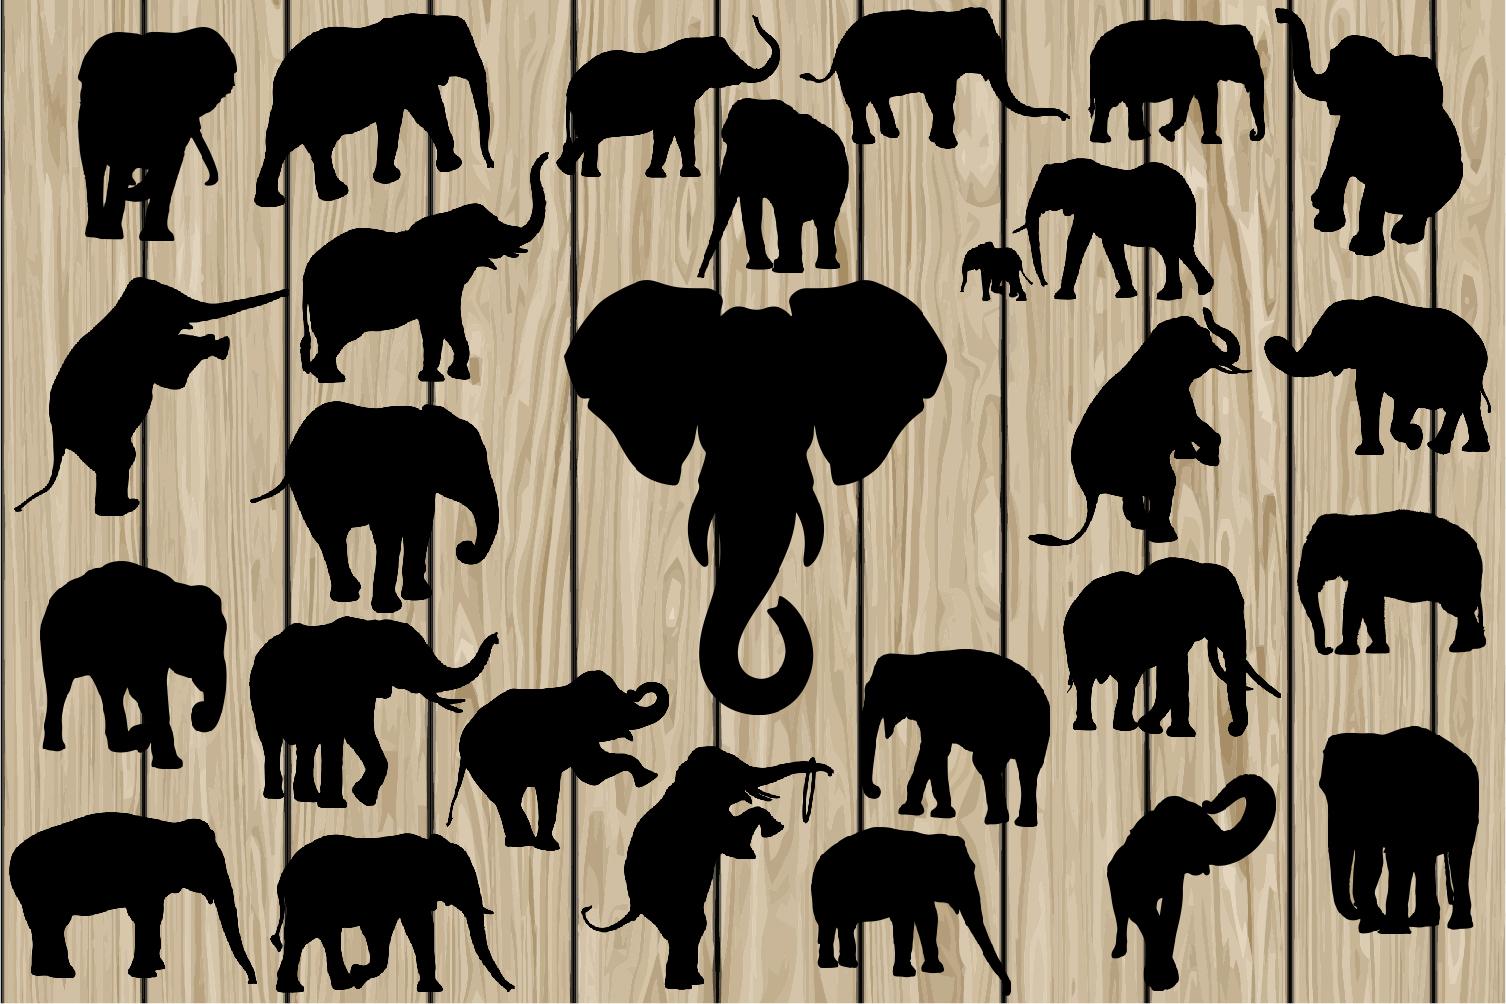 26 Elephant SVG, Elephant EPS, Elephant Vector, Elephant Silhouette Clipart, Elephant DXF, Elephant Png, Elephant Cutting File, Printable. example image 1